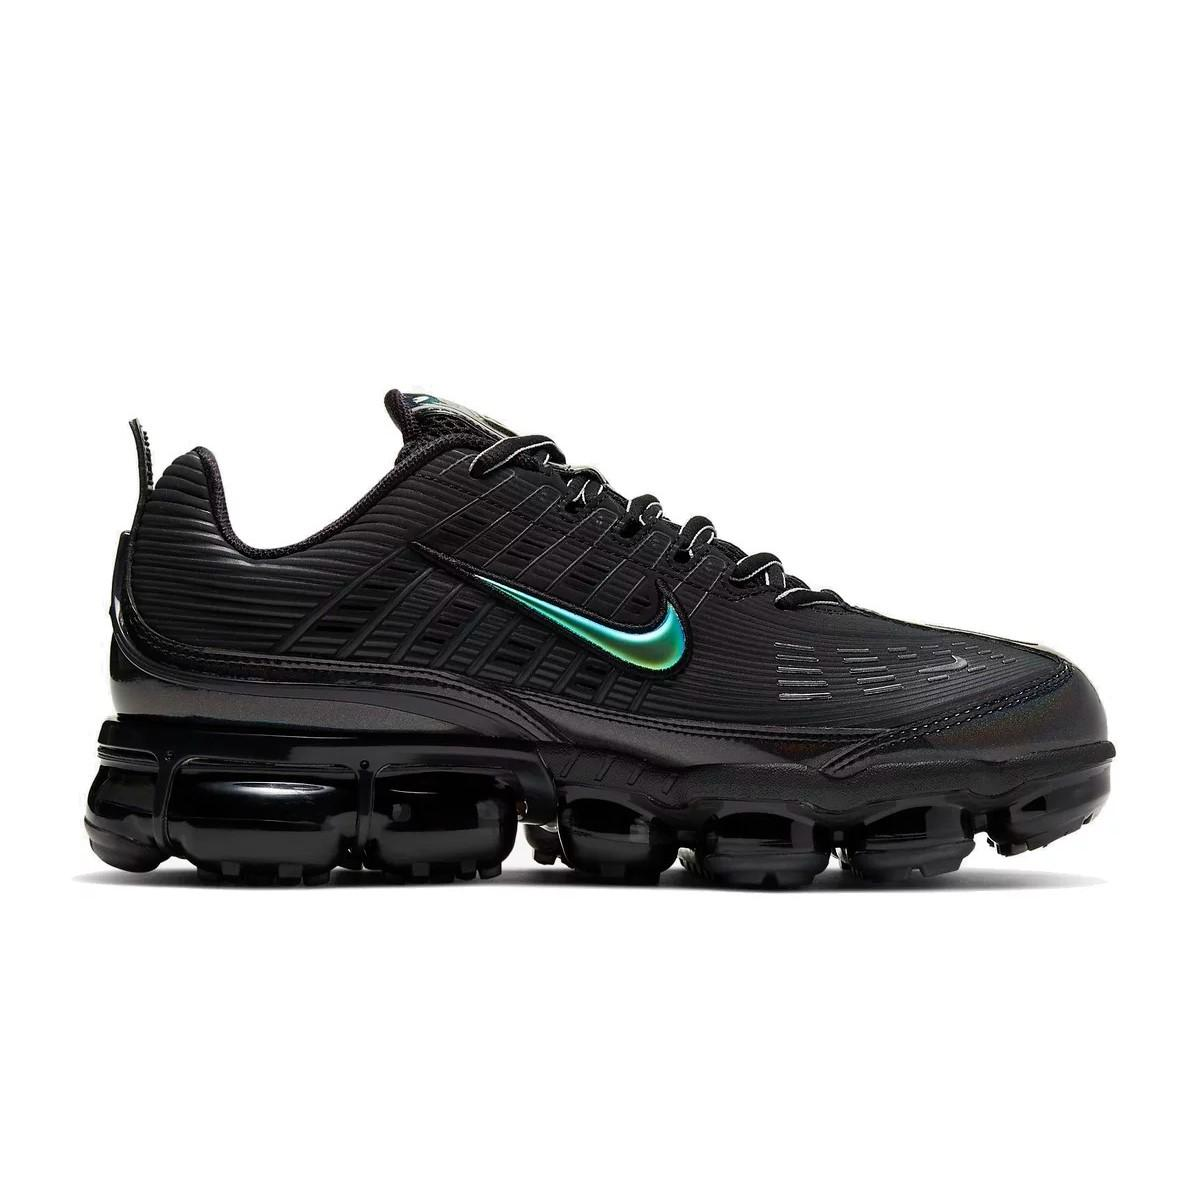 NIKE 黑色 AIR VAPORMAX 360 運動鞋